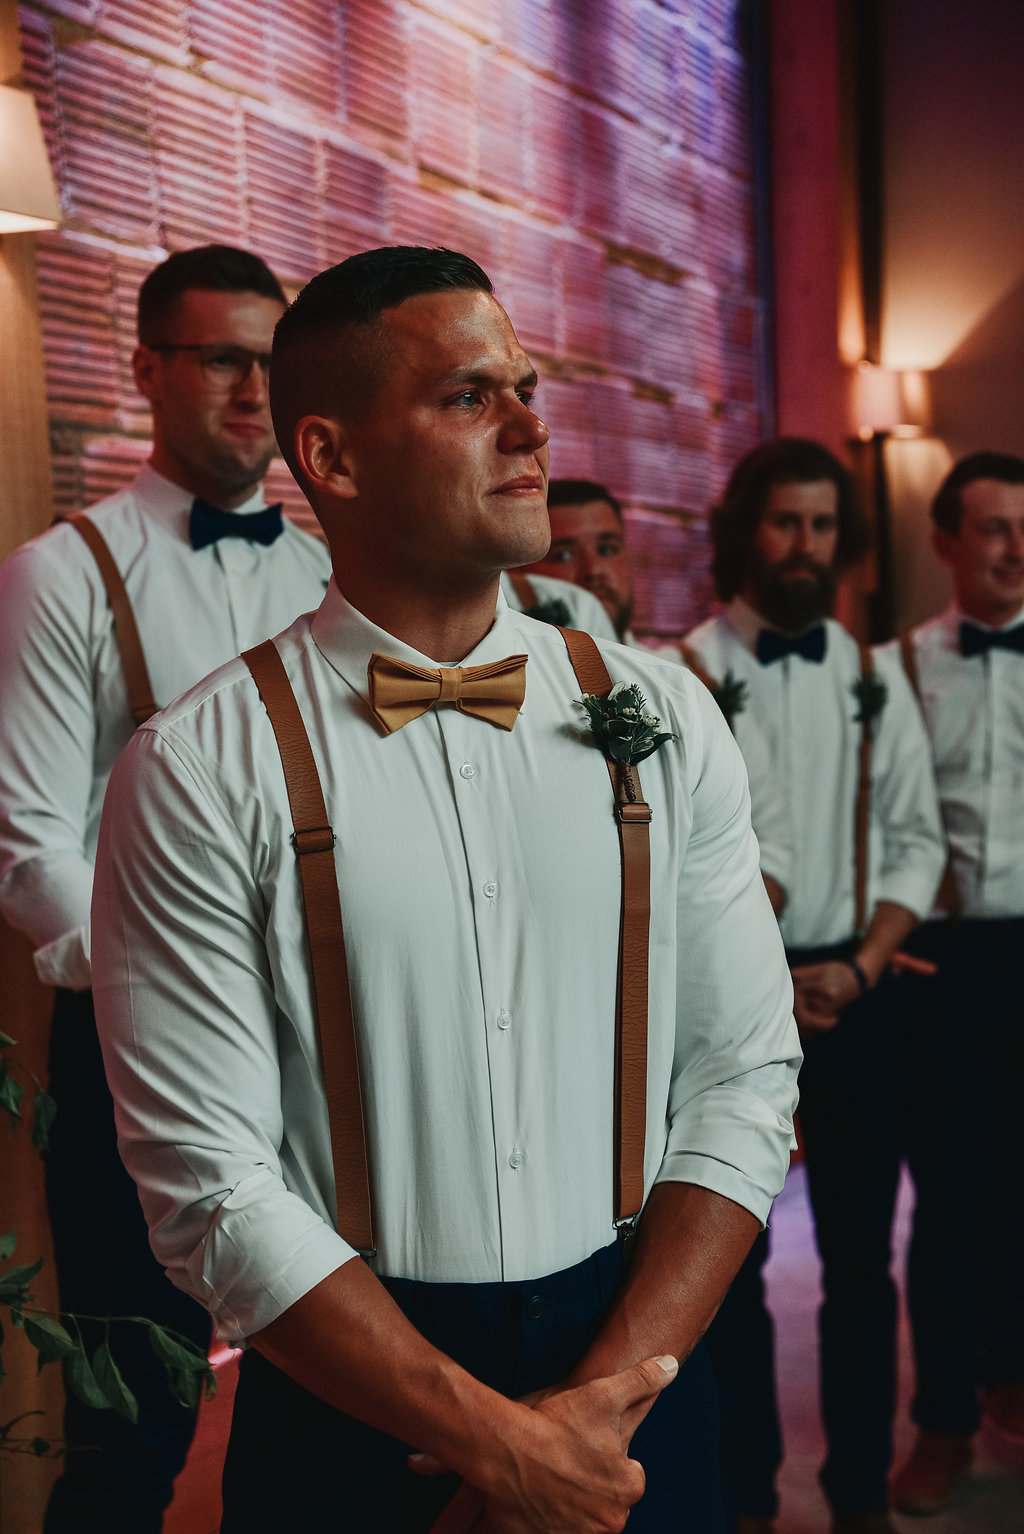 c_s_wedding-250.jpg